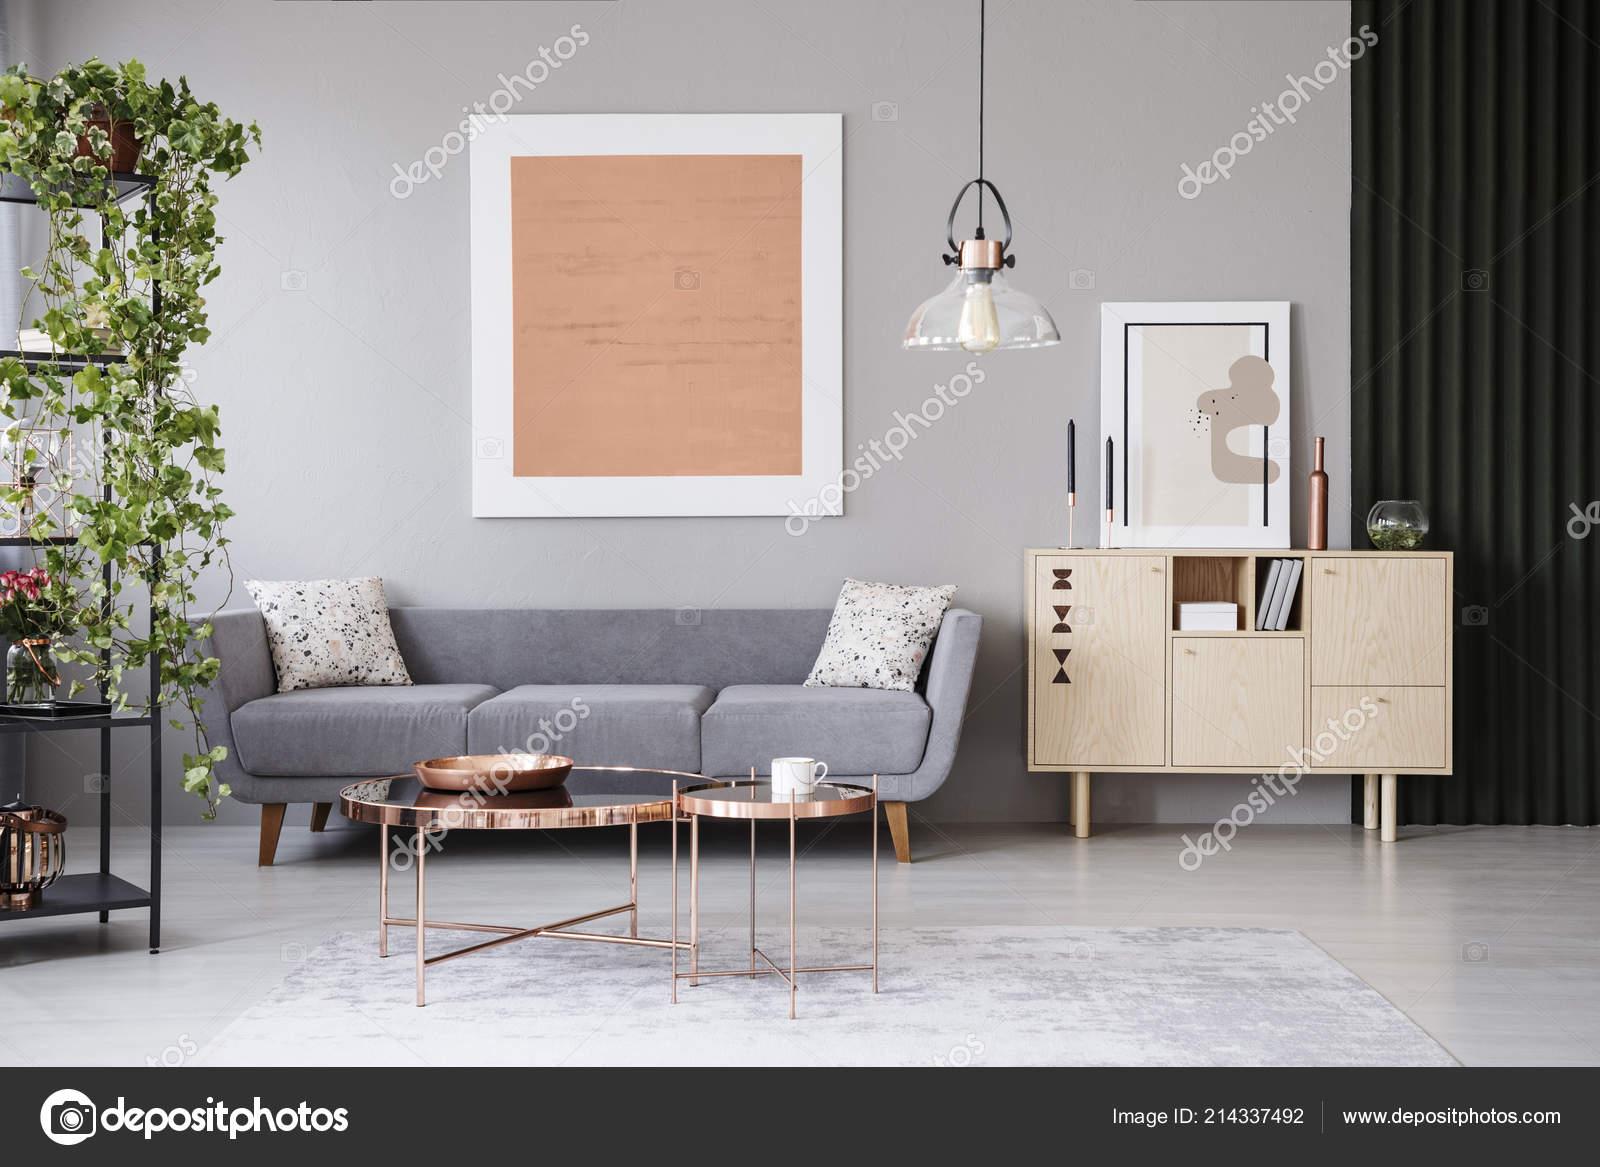 Modern Interieur Schilderij : Gallery of modern interieur stijl modern interieur een modern